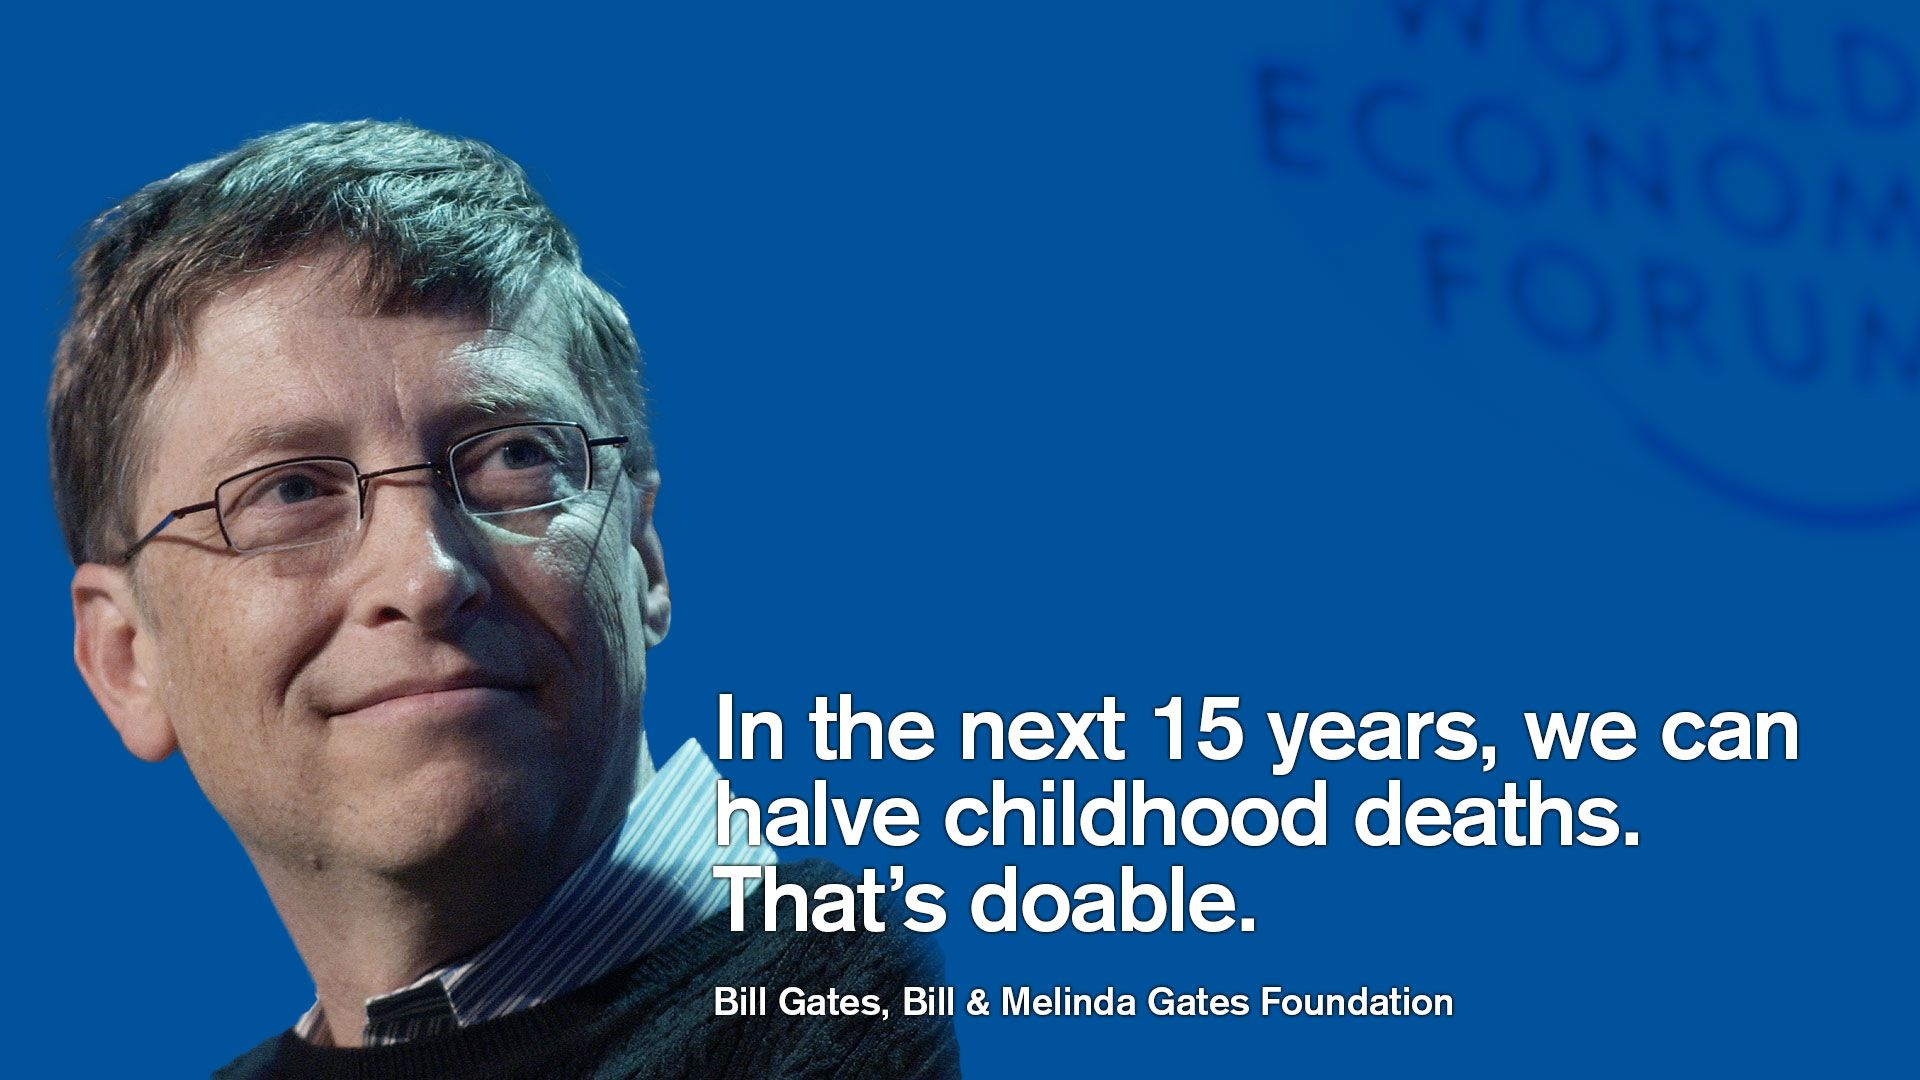 Bill Gates Bill & Melinda Gates Foundation at the World Economic